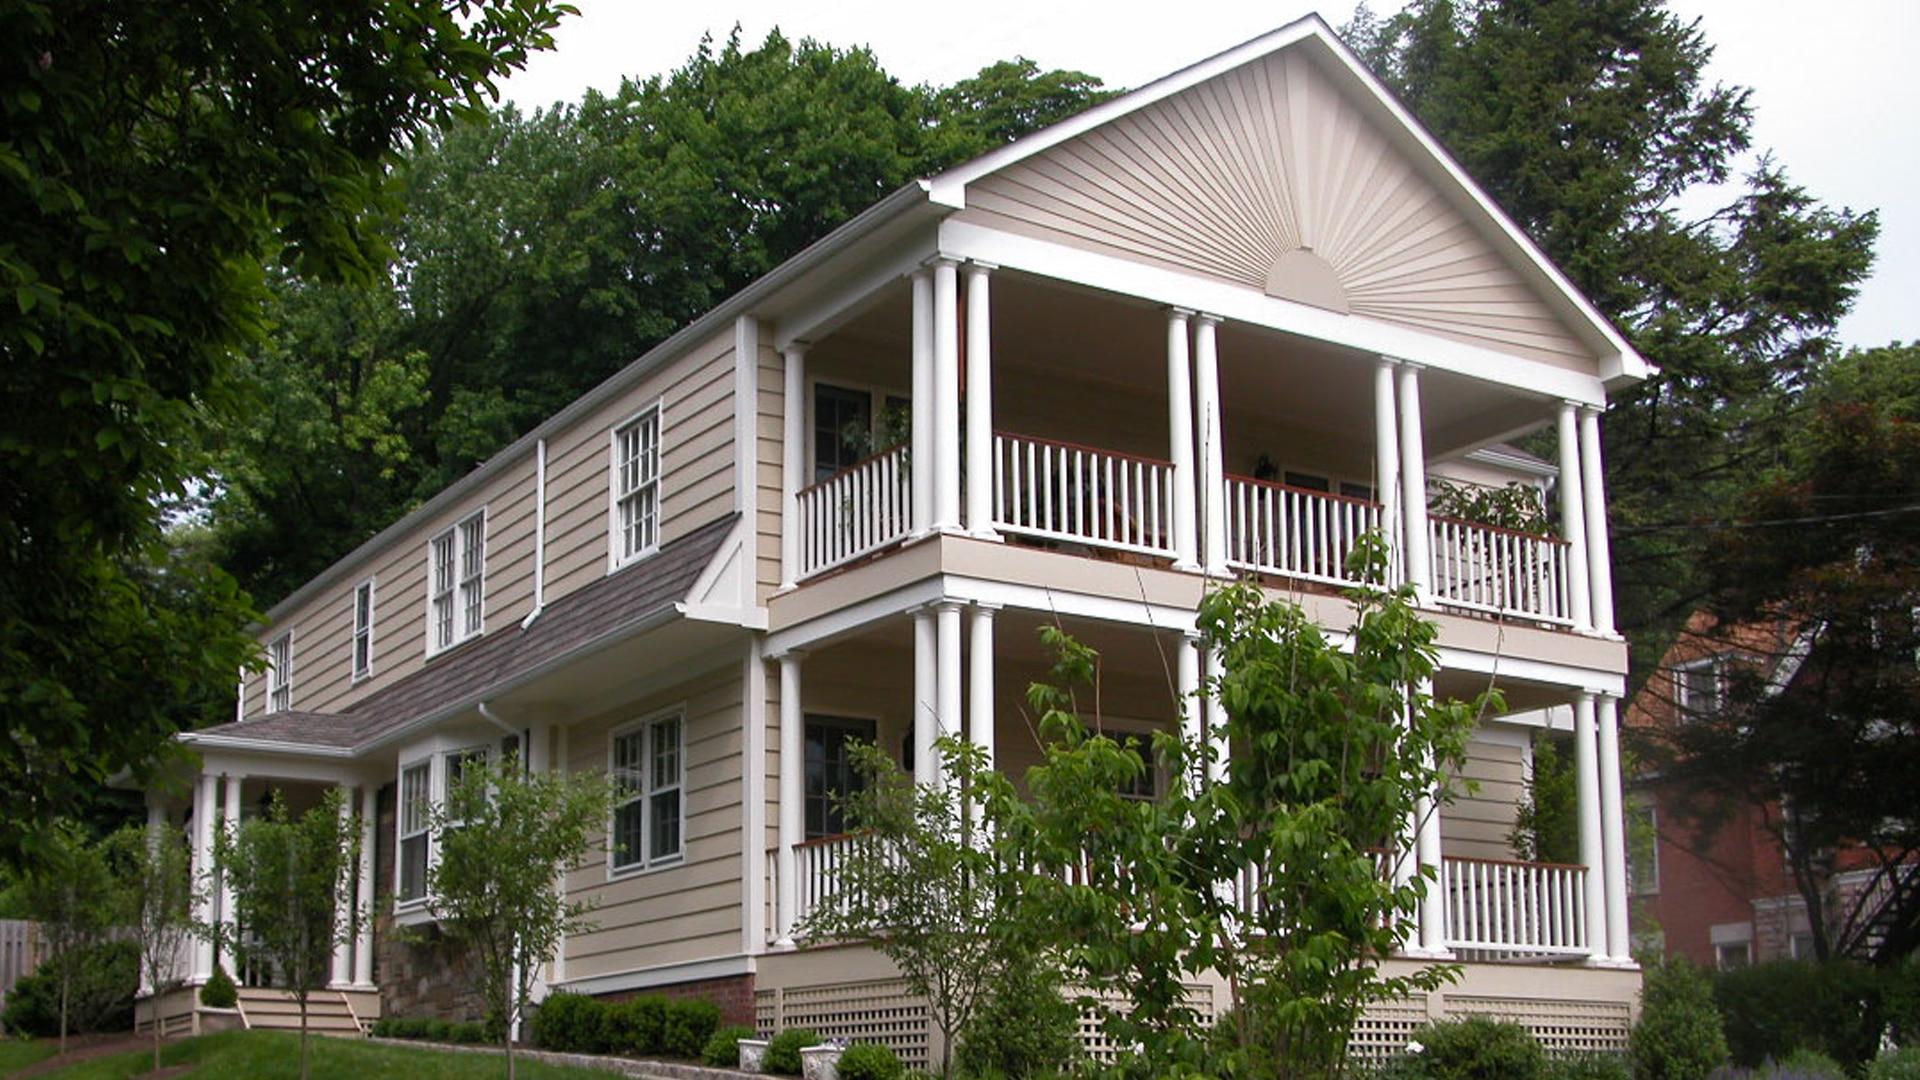 Residential Renovation, Newburgh, NY | Alfandre Architecture